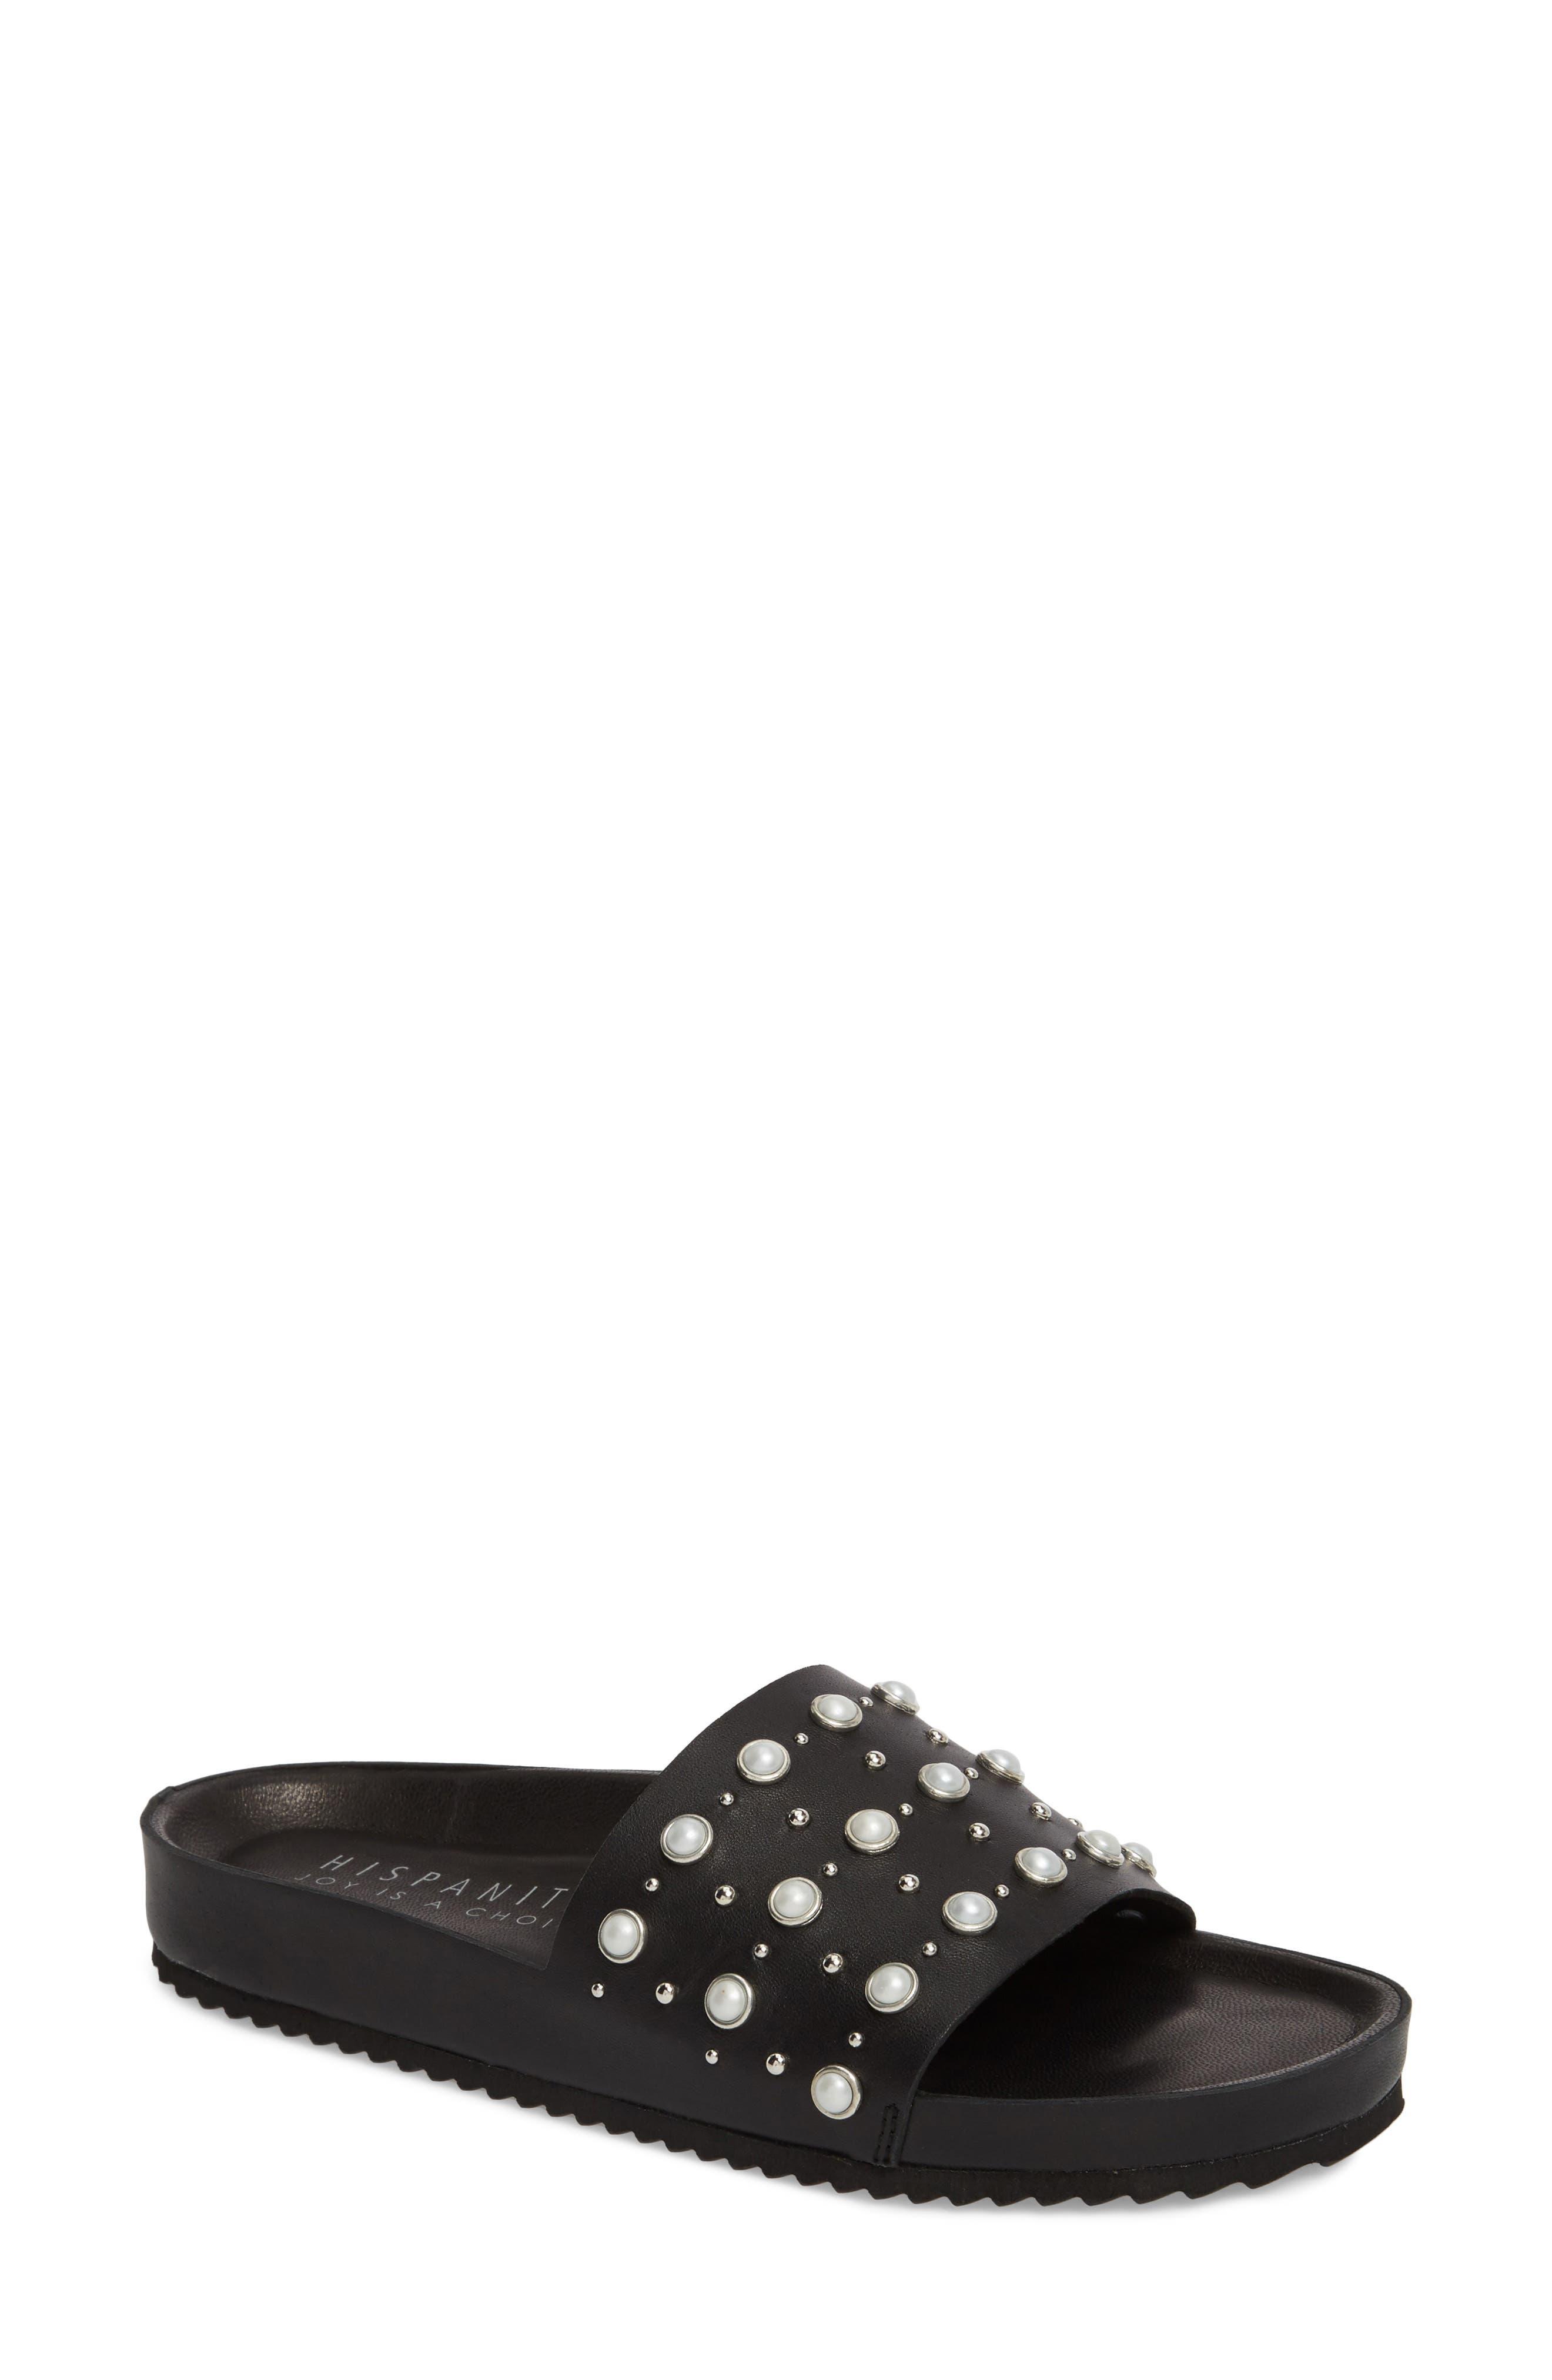 Santori Slide Sandal,                         Main,                         color, Napa Black Leather